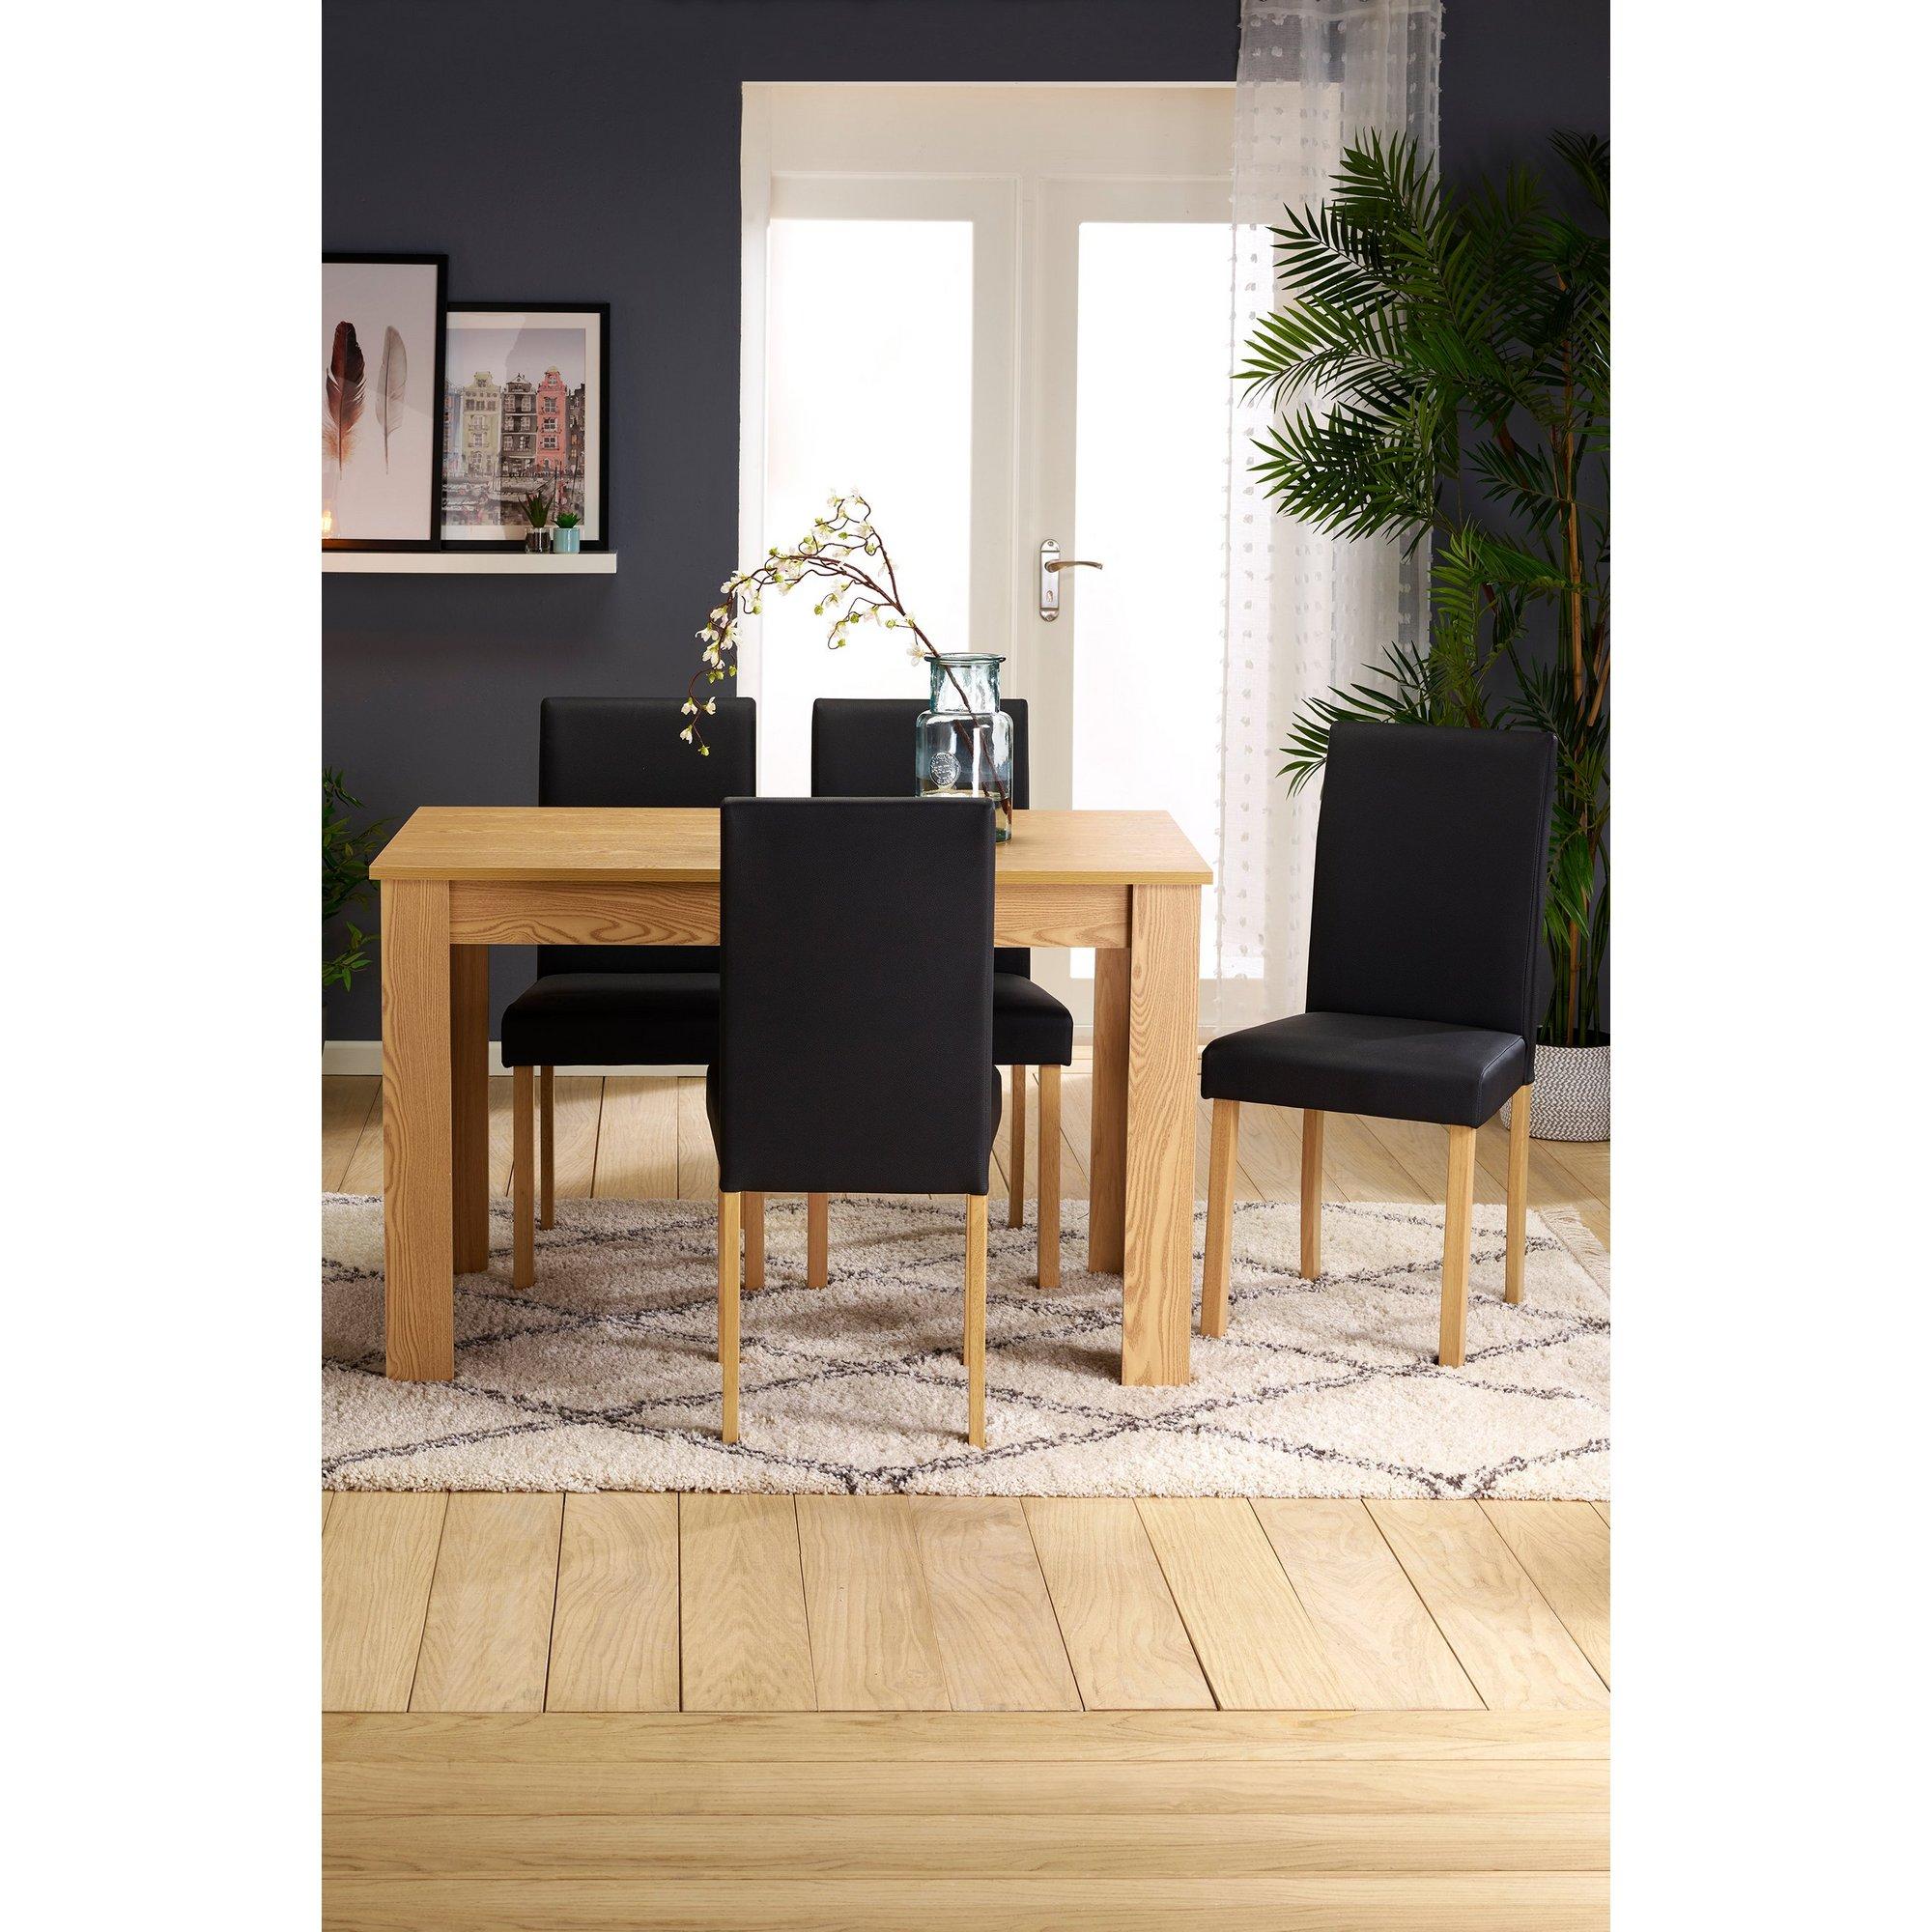 Image of Kingston 5 Piece Dining Set